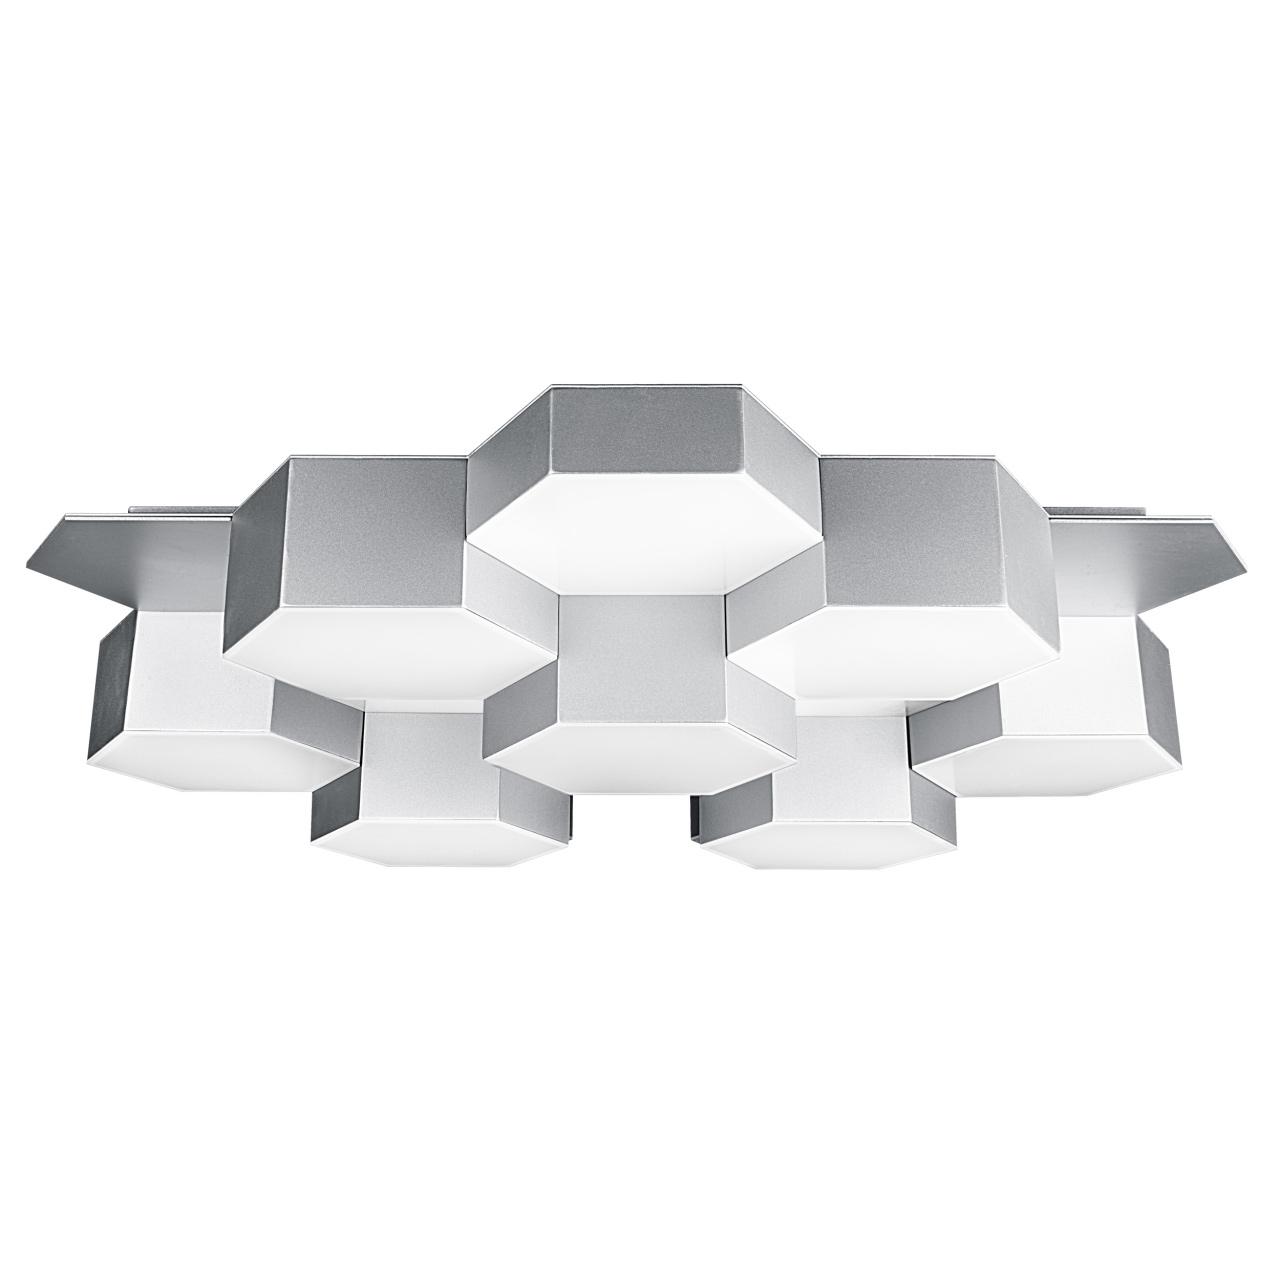 Люстра потолочная Favo LED-80W 3840LM silver 4000K Lightstar 750164